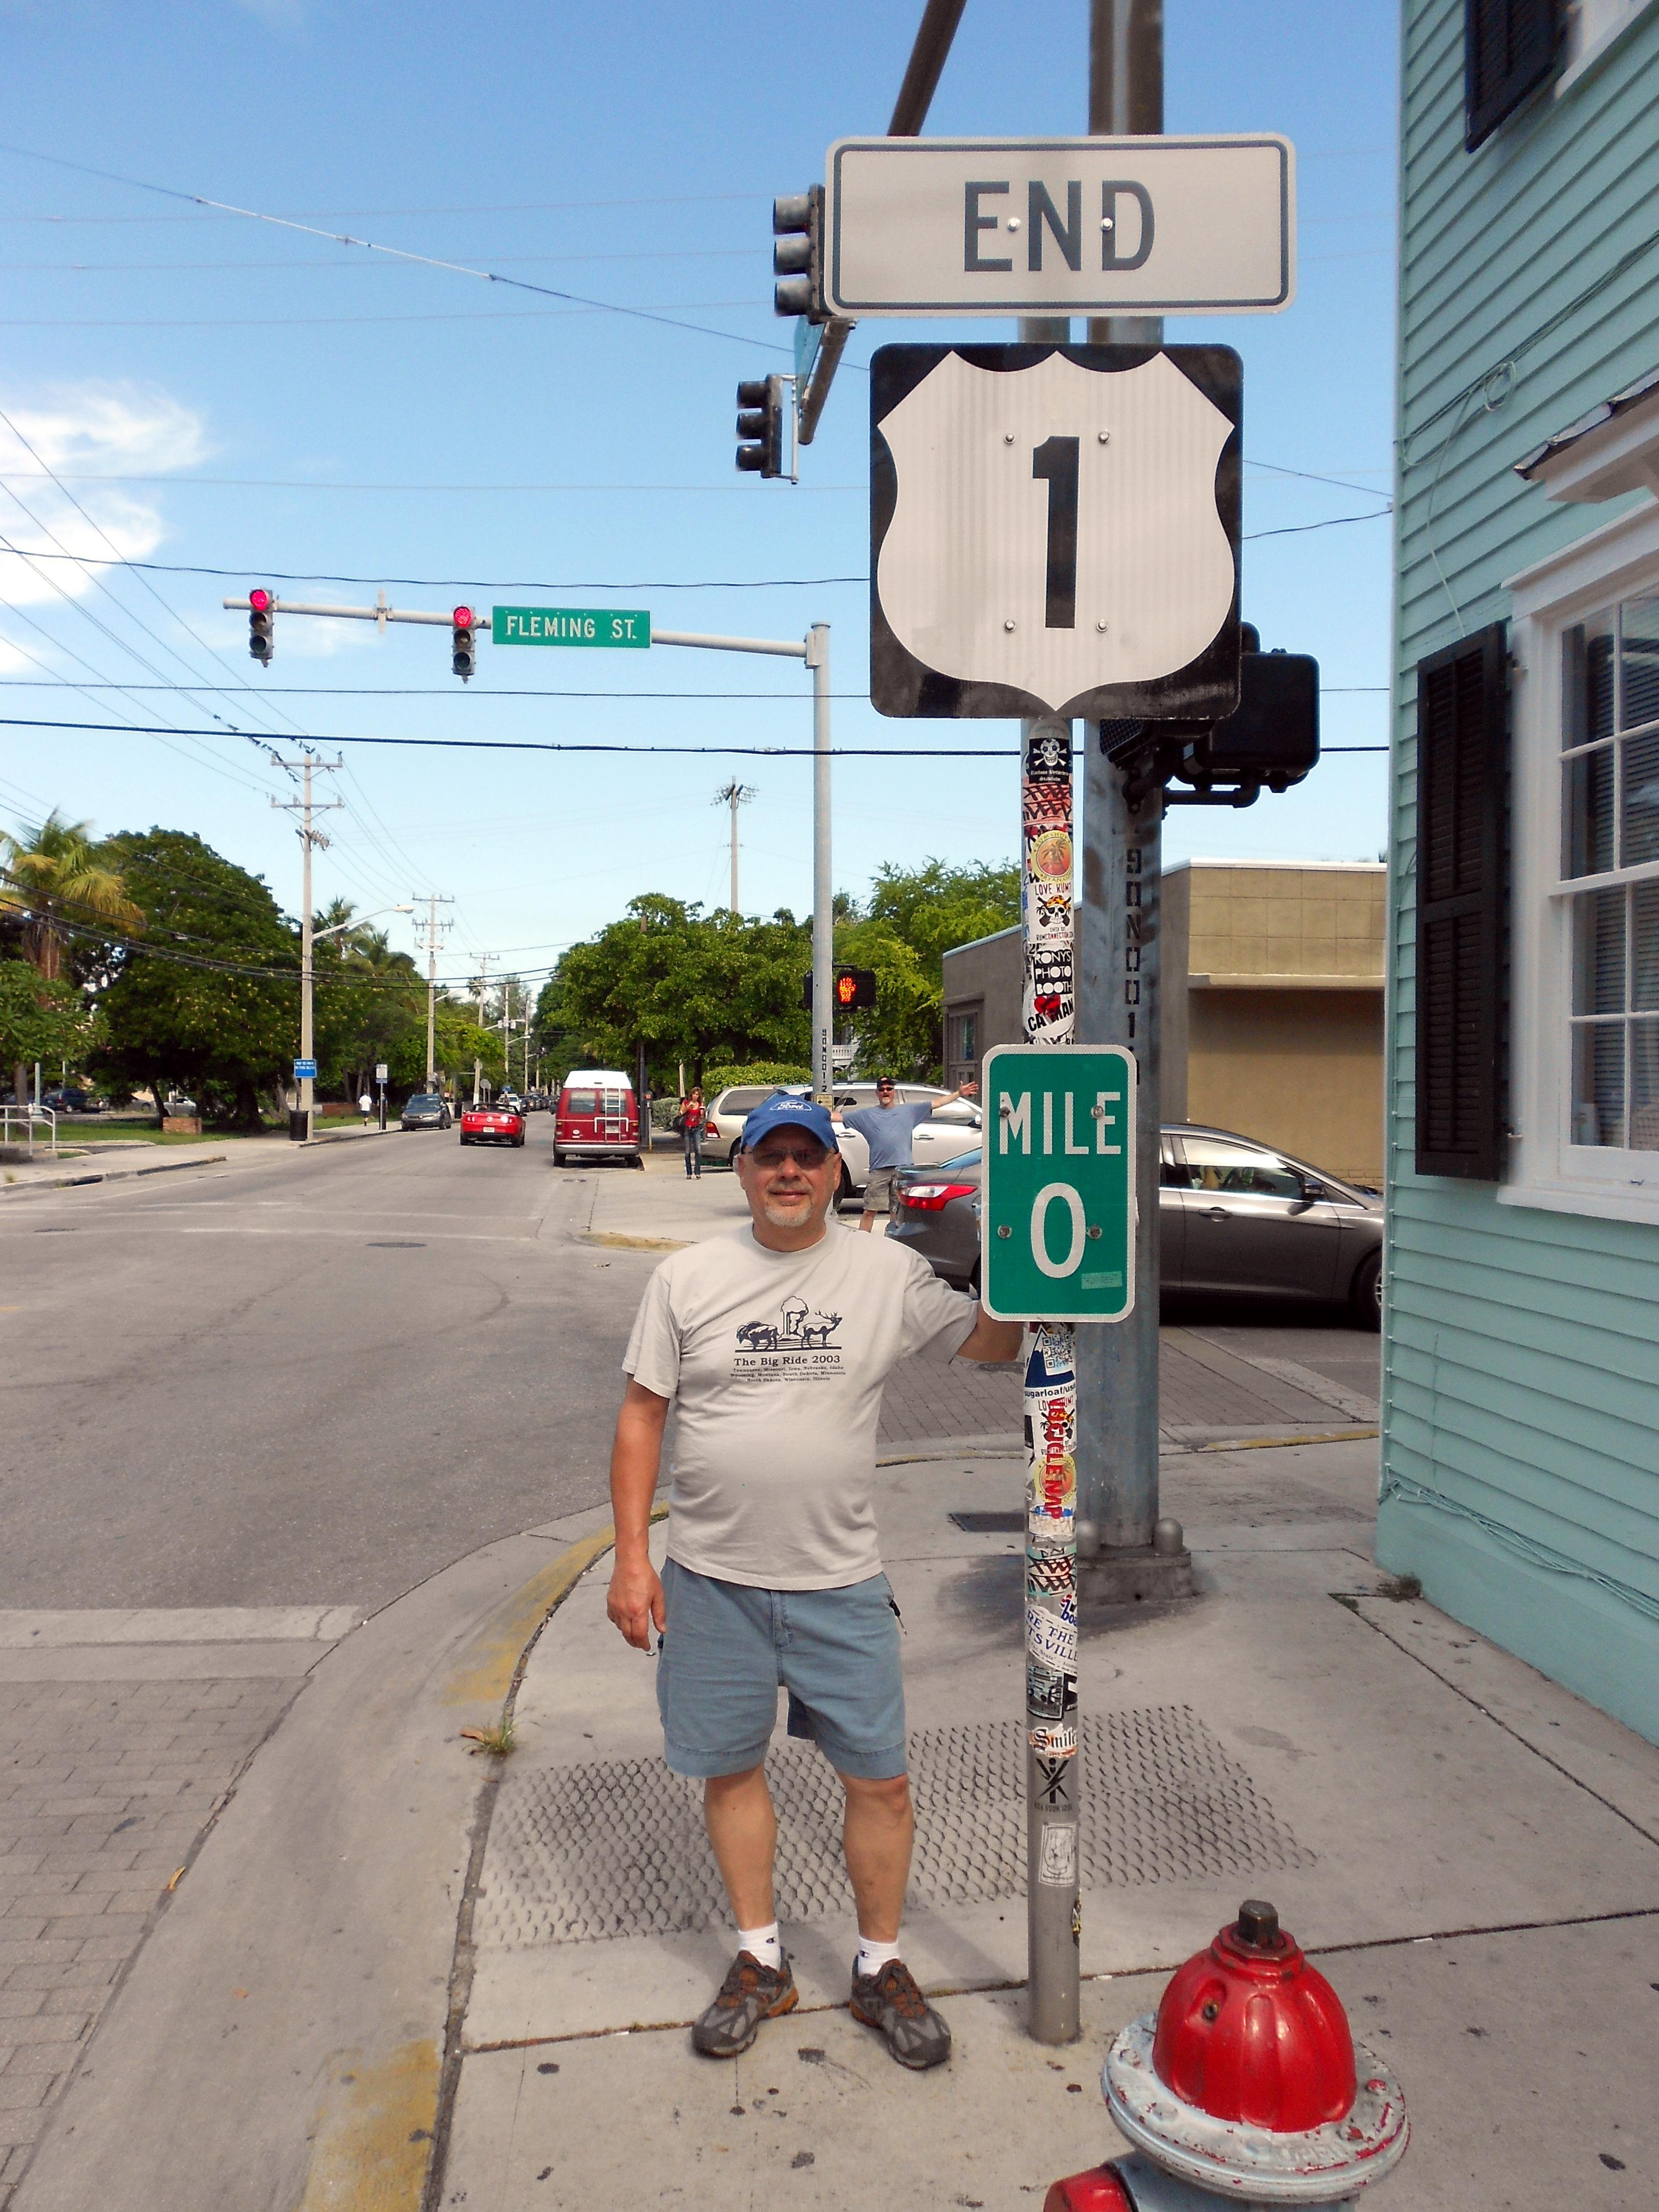 Mile 0 Sign